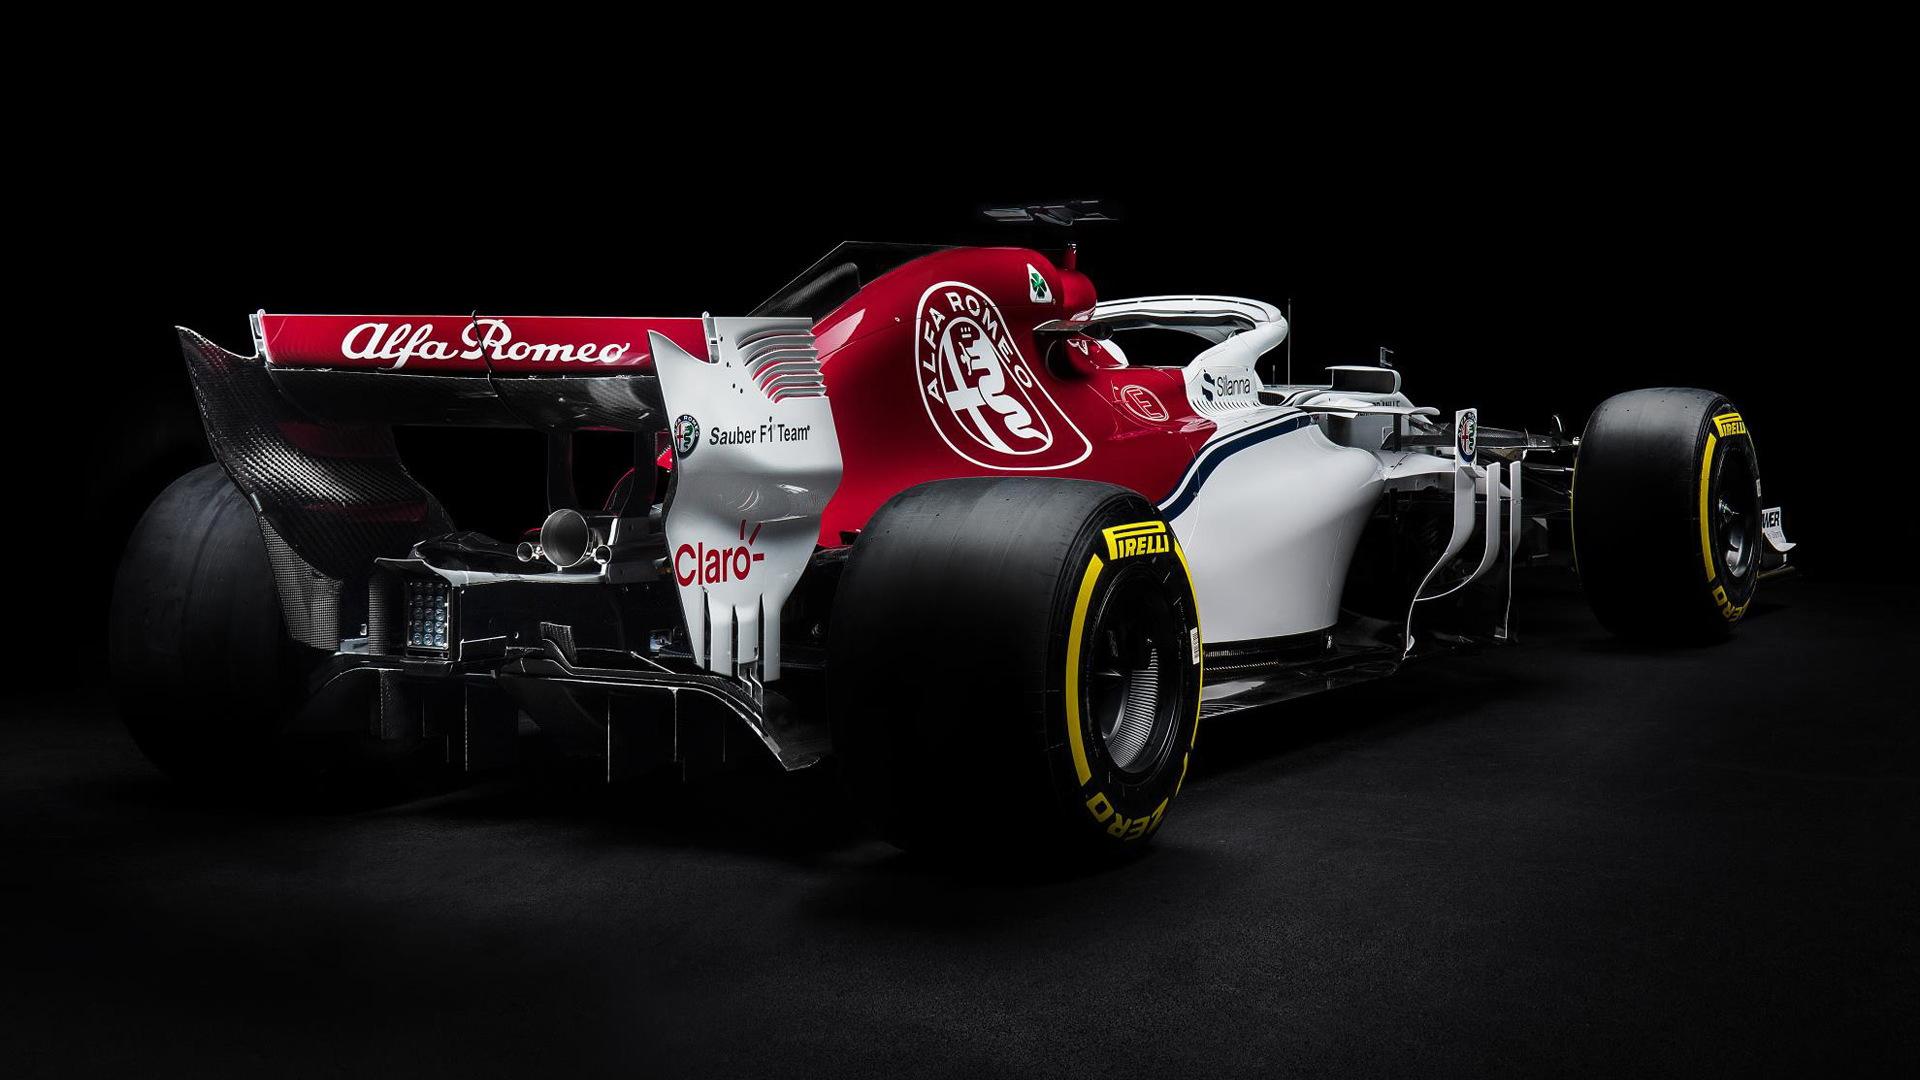 2018 Sauber C37 Formula 1 race car